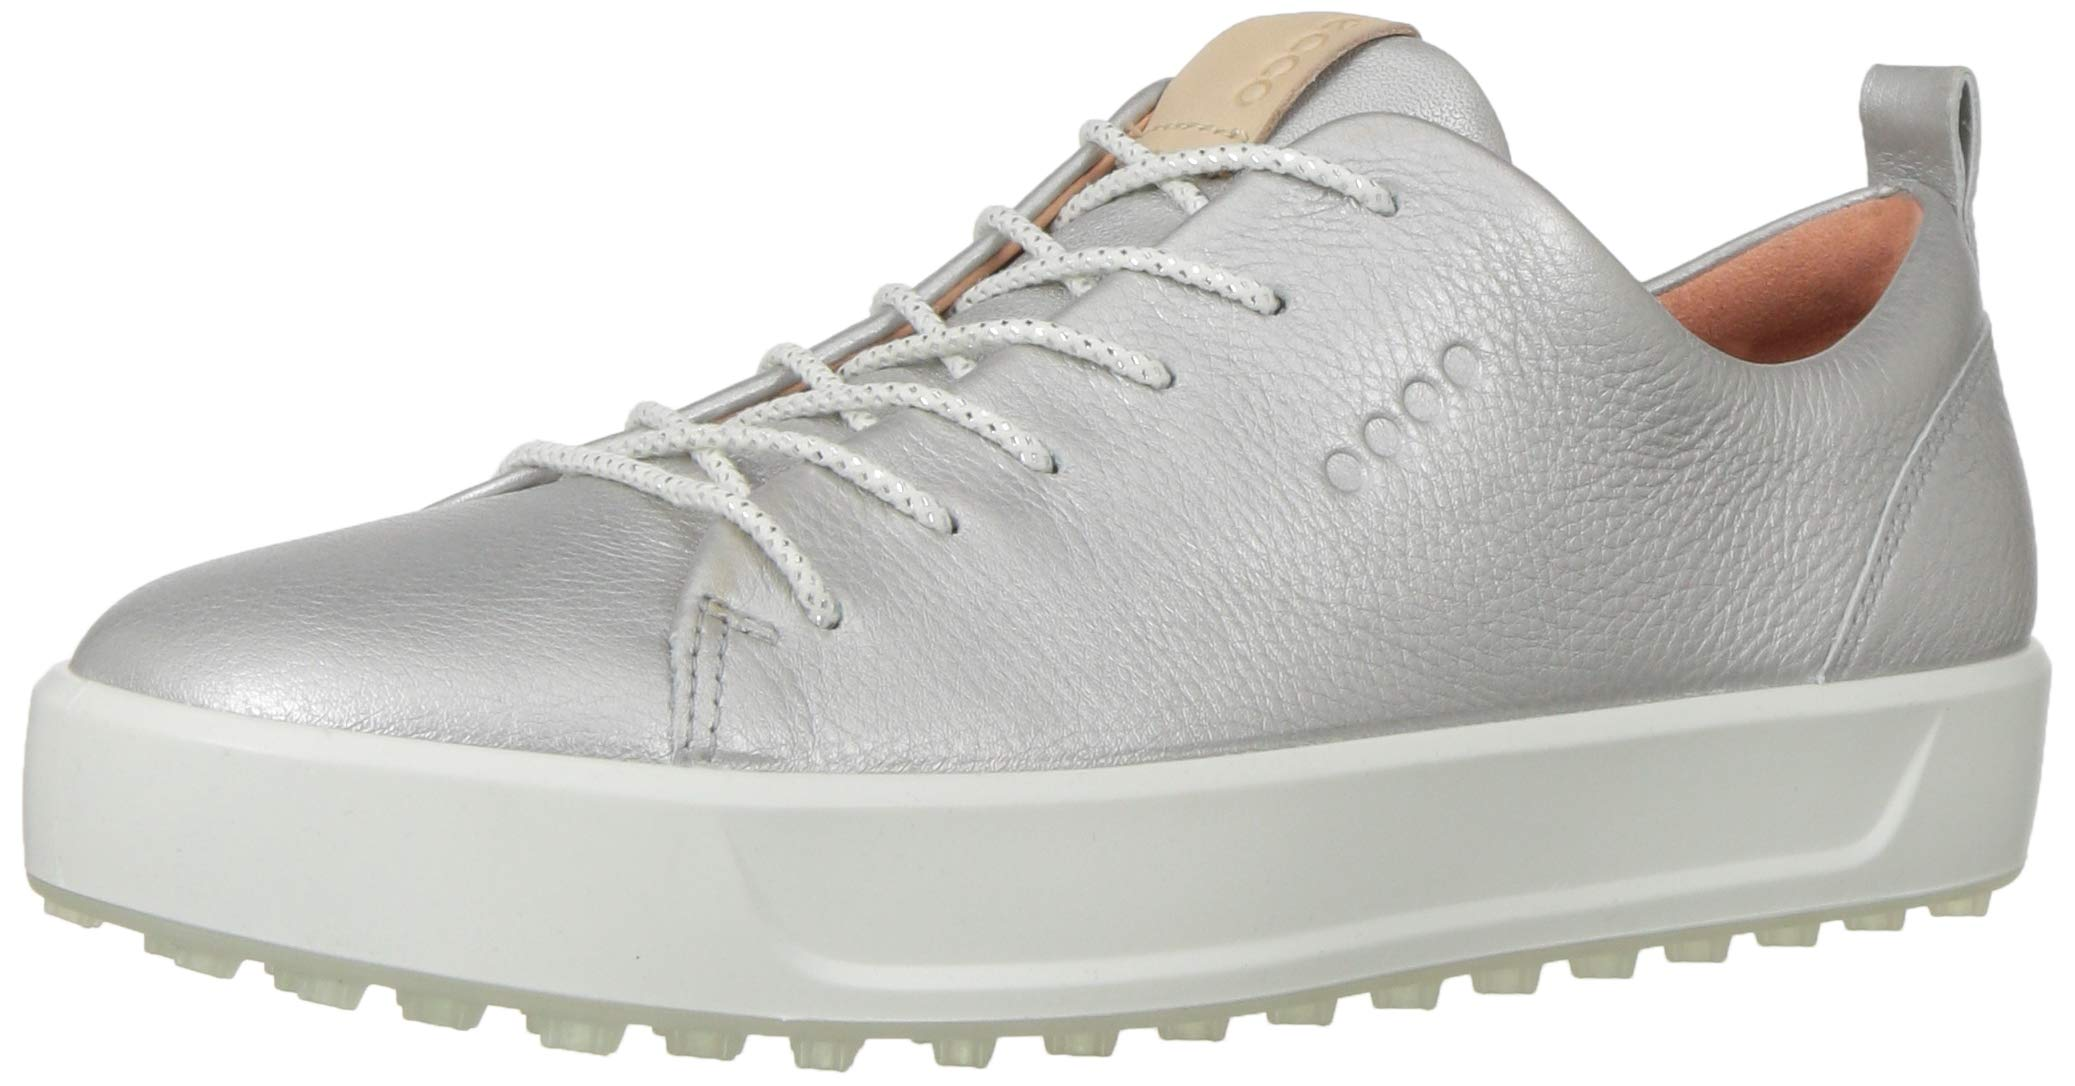 ECCO Women's Soft Low Hydromax Golf Shoe, alusilver Metallic, 36 M EU (5-5.5 US)